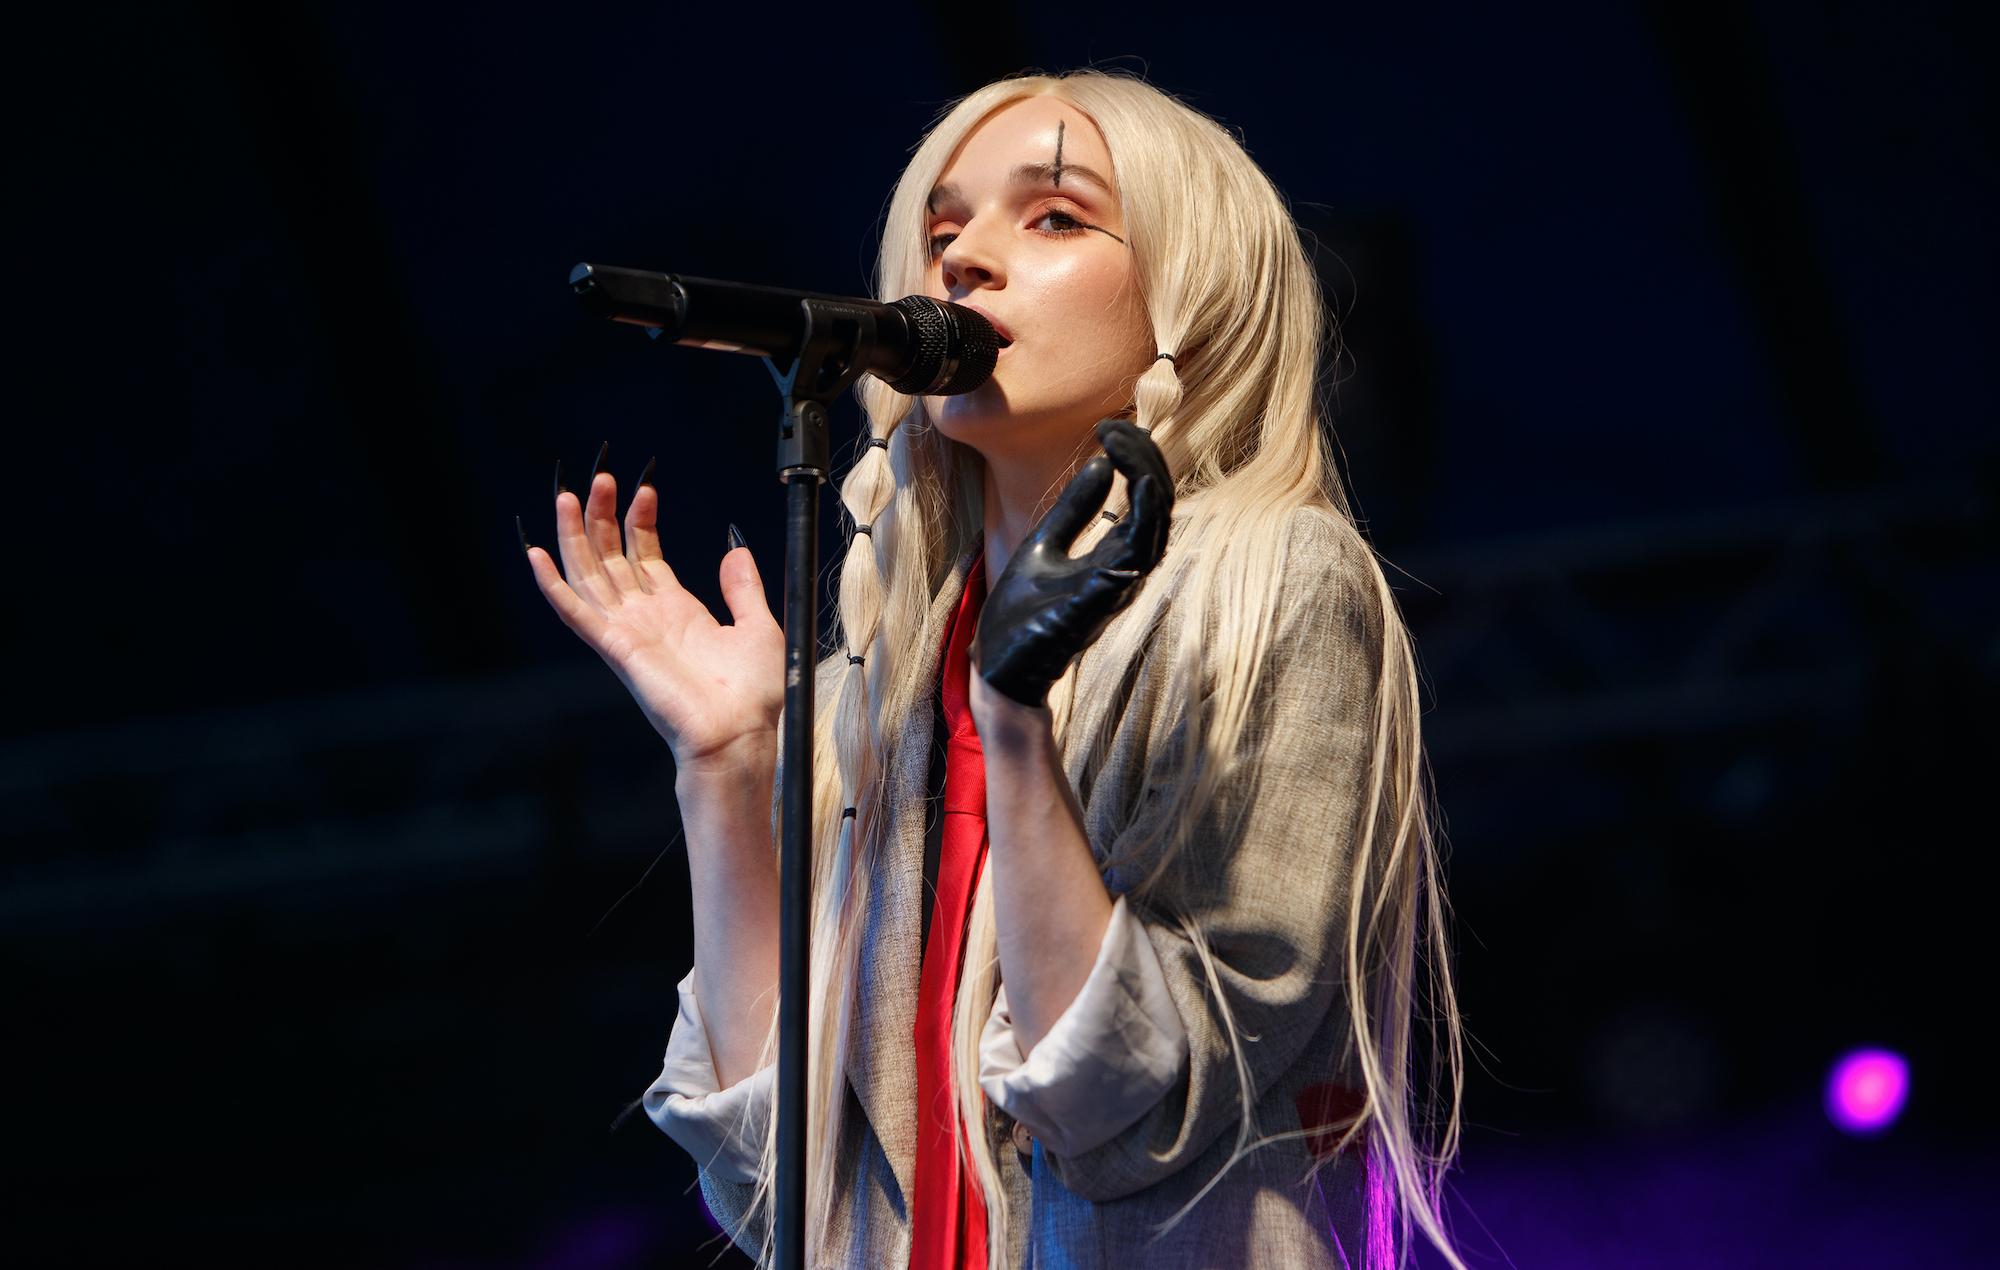 Poppy confirms rescheduled UK and European tour dates - EpicNews